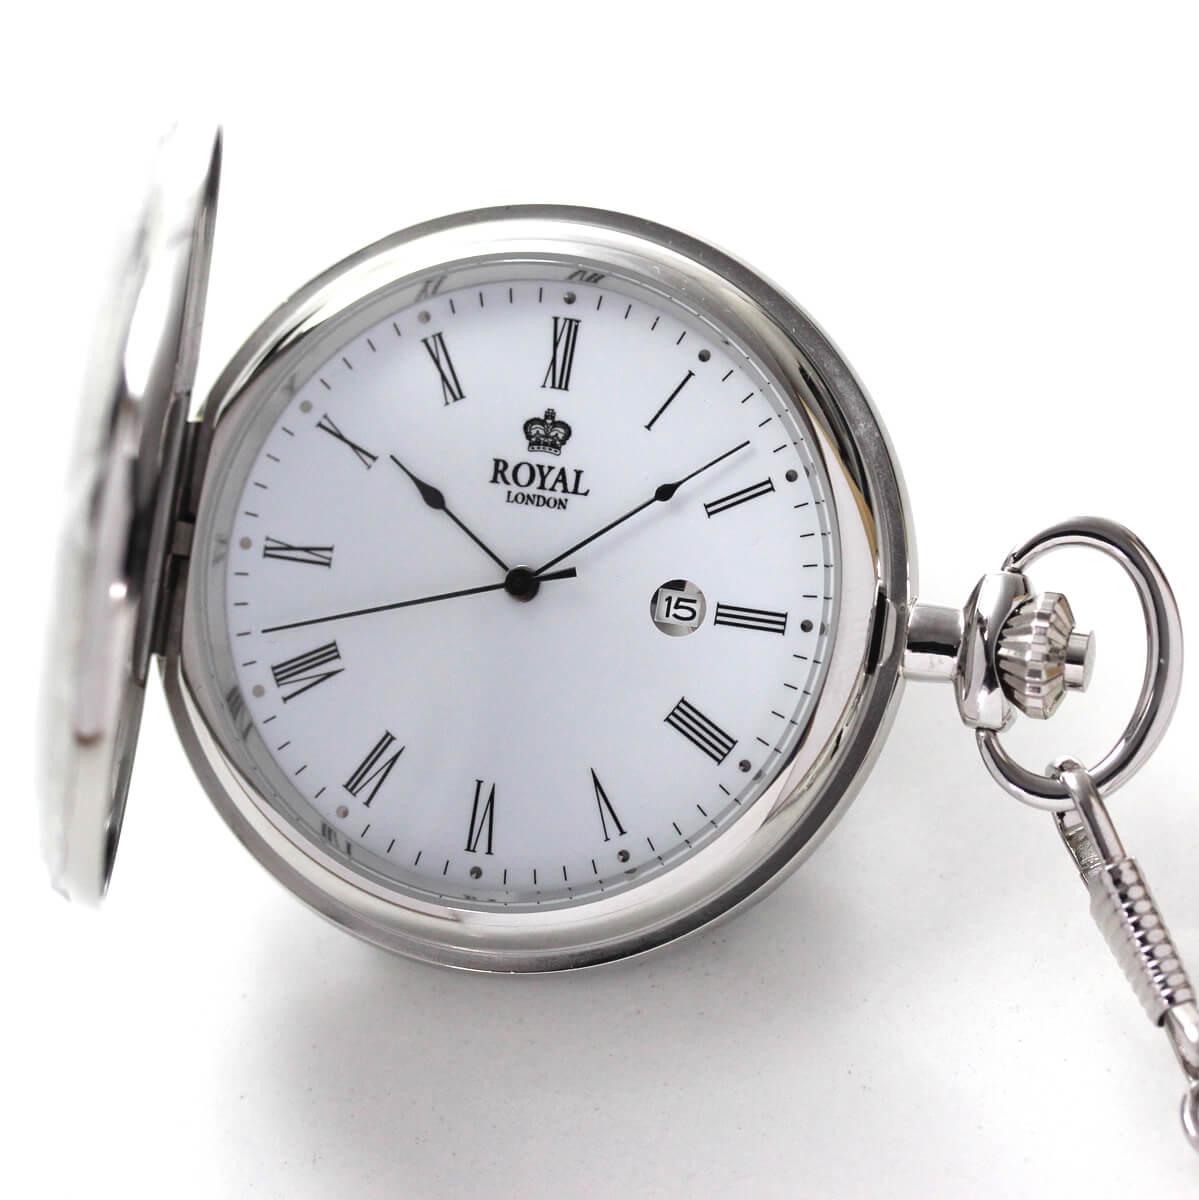 ROYAL LONDON(ロイヤルロンドン) クォーツ懐中時計 90001-01